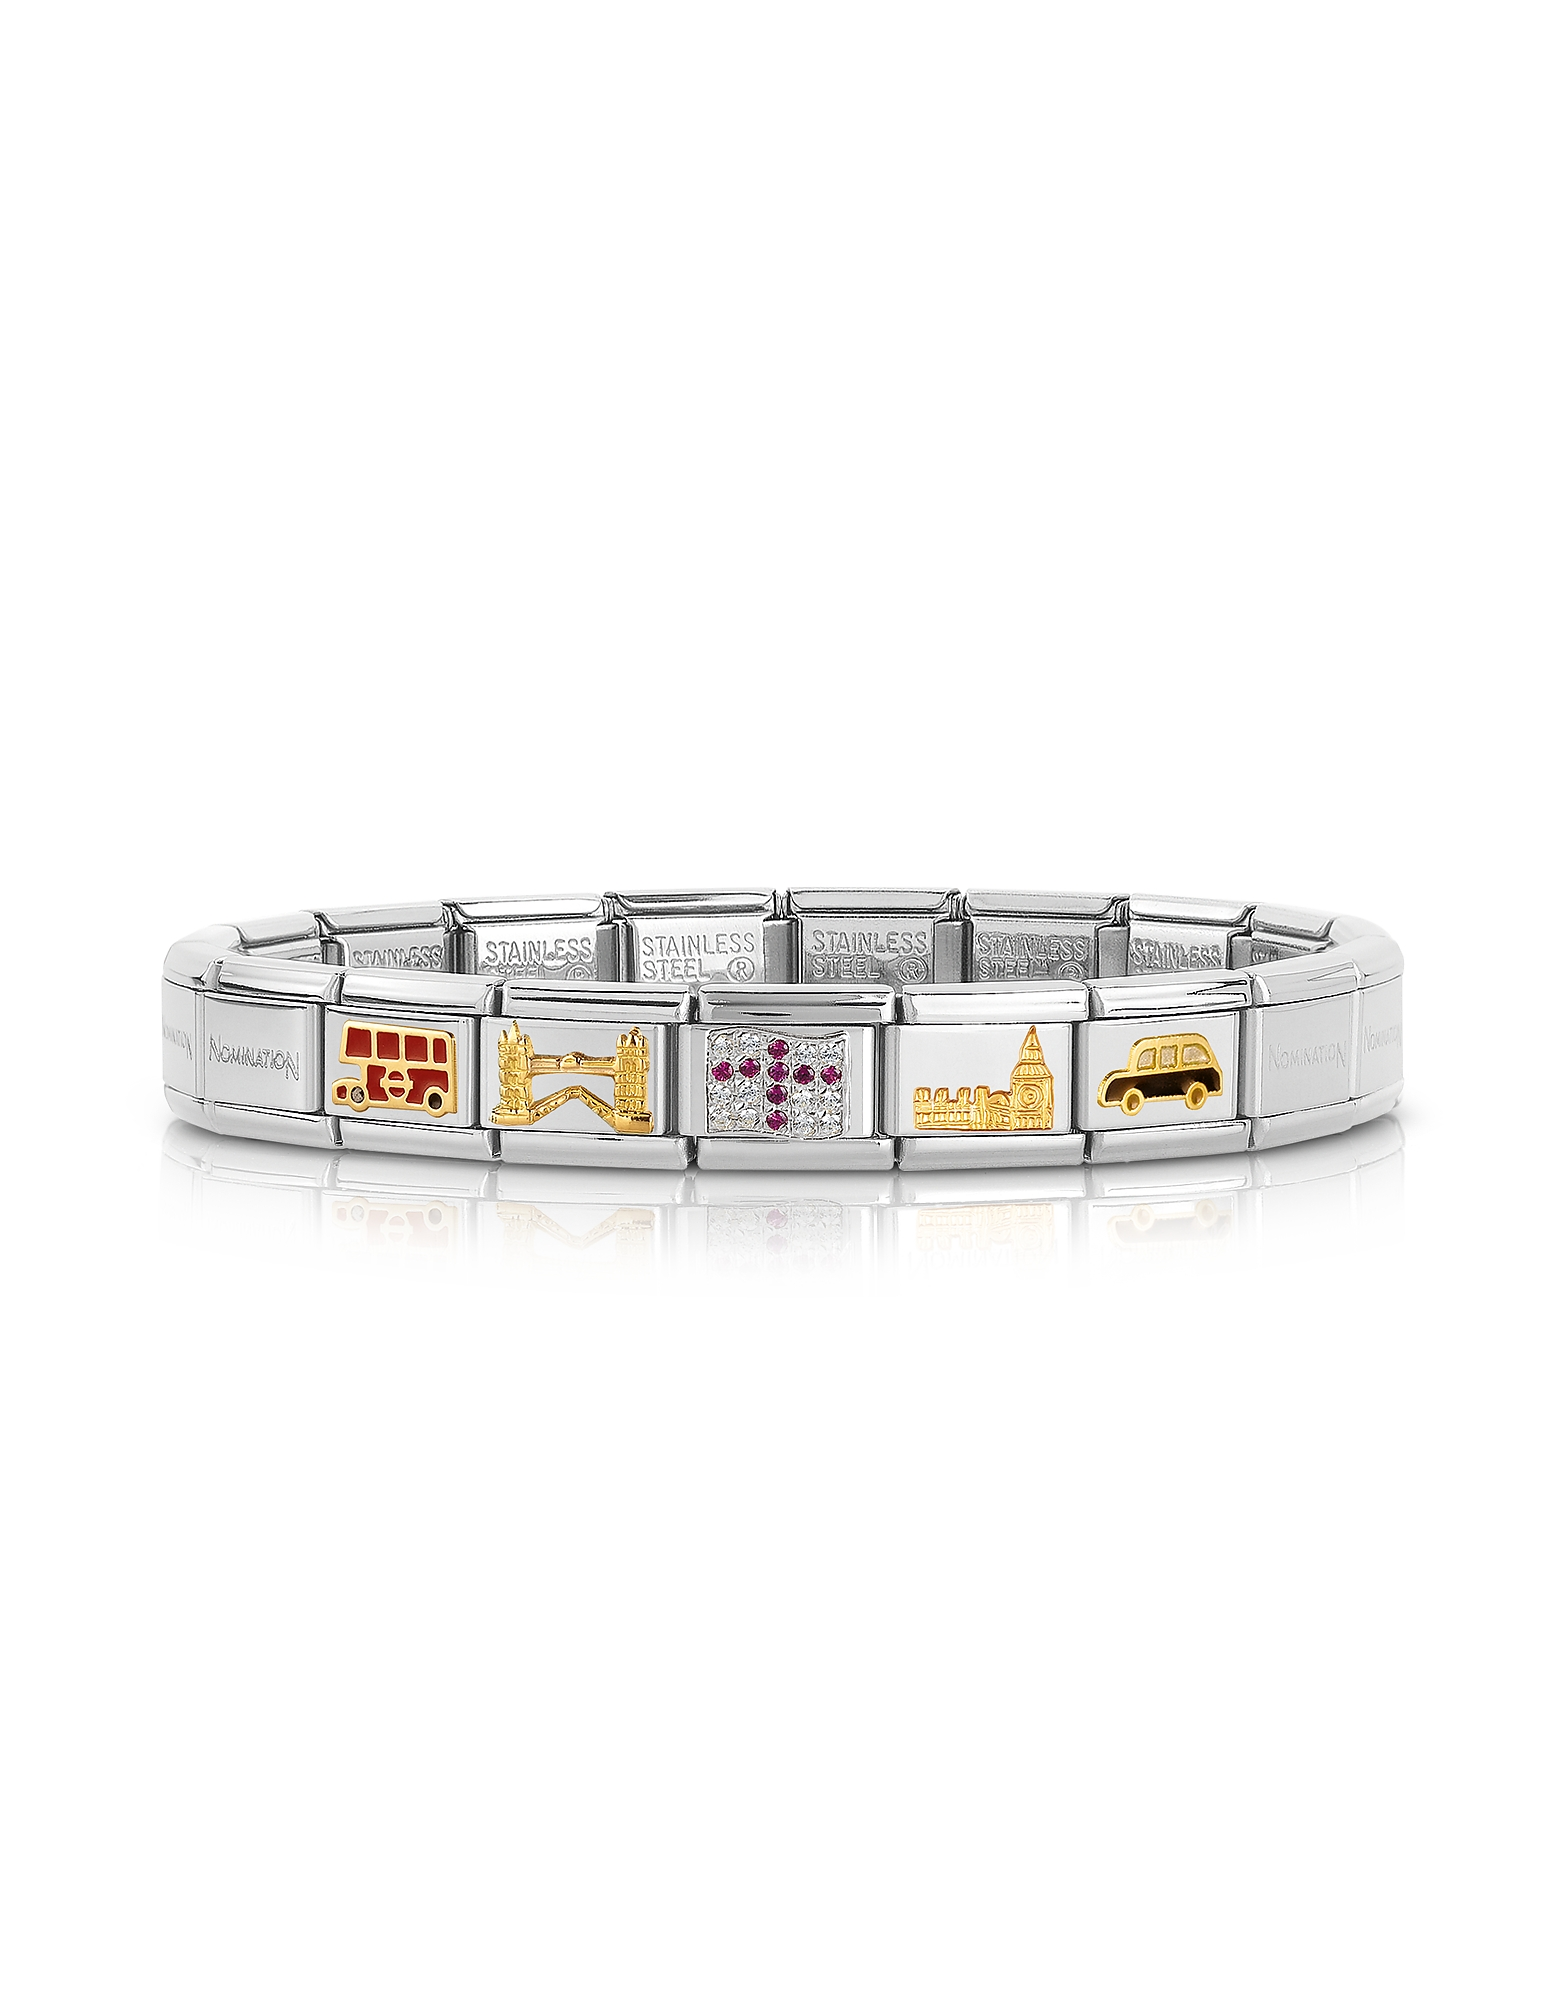 Nomination Bracelets, Classic England Golden Stainless Steel Bracelet w/Cubic Zirconia Flag